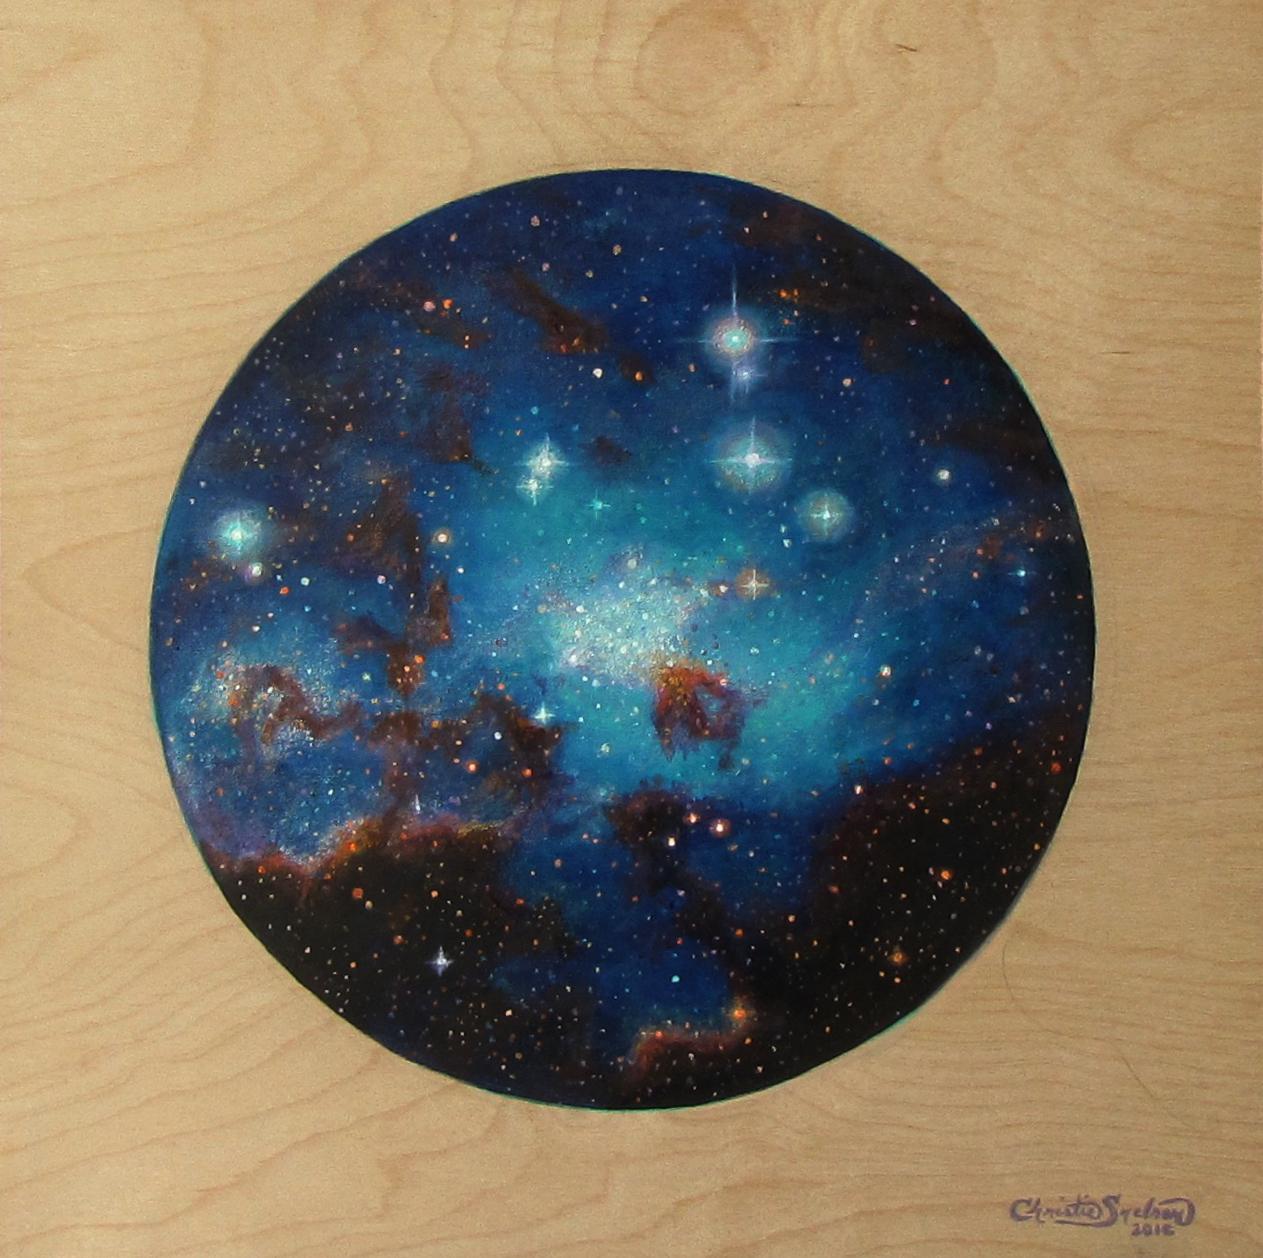 """15: Star Forming Region in the LMC"""